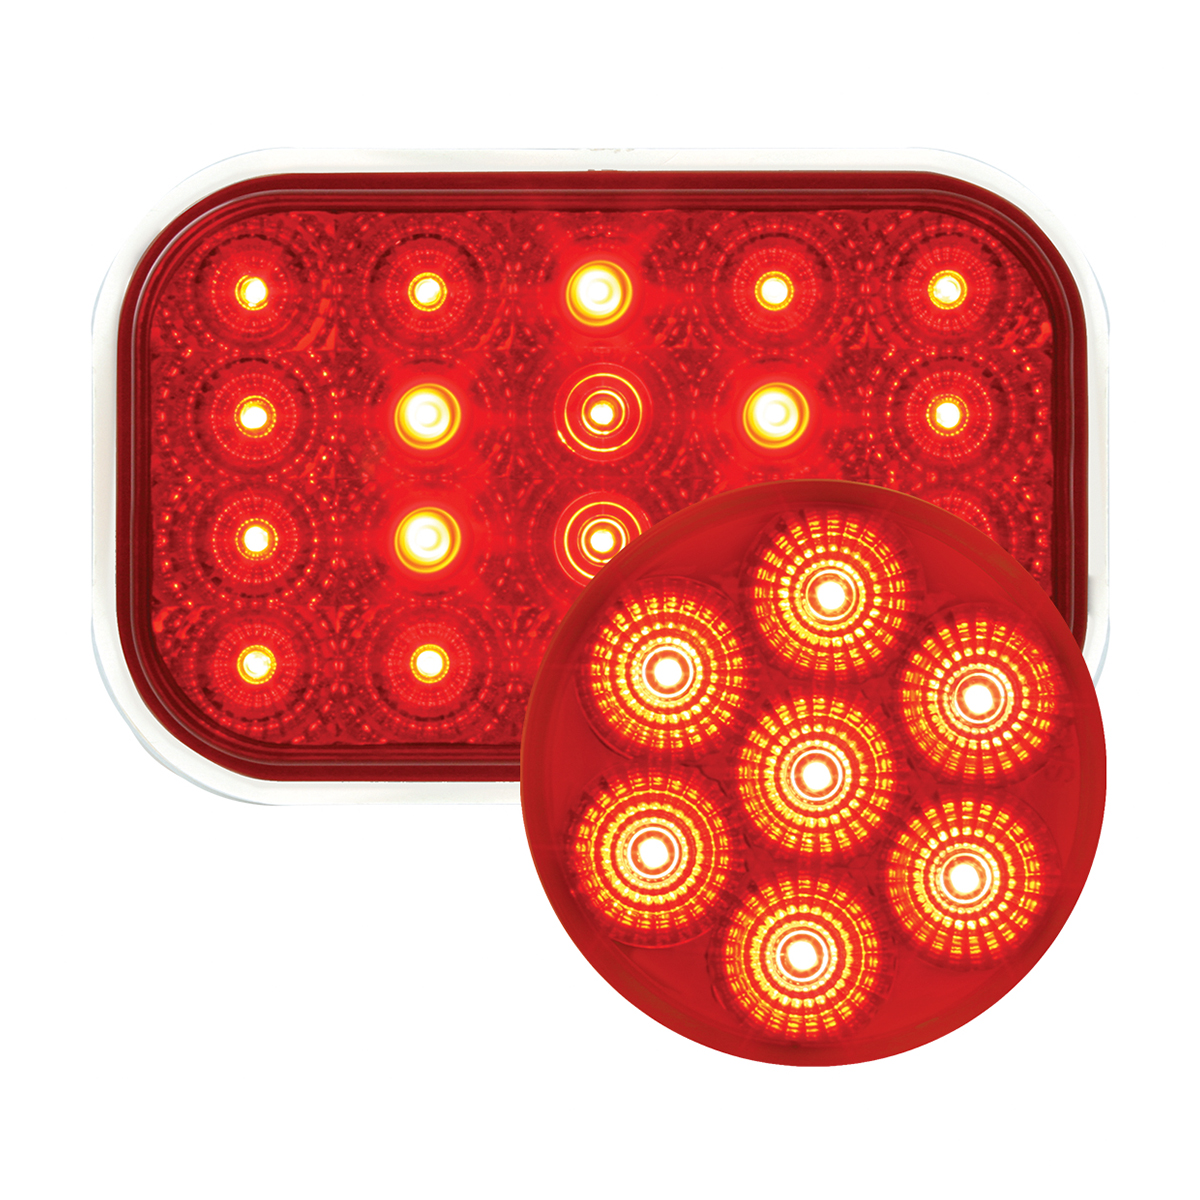 #77013/#76622 Spyder LED Flat Light - Red/Red